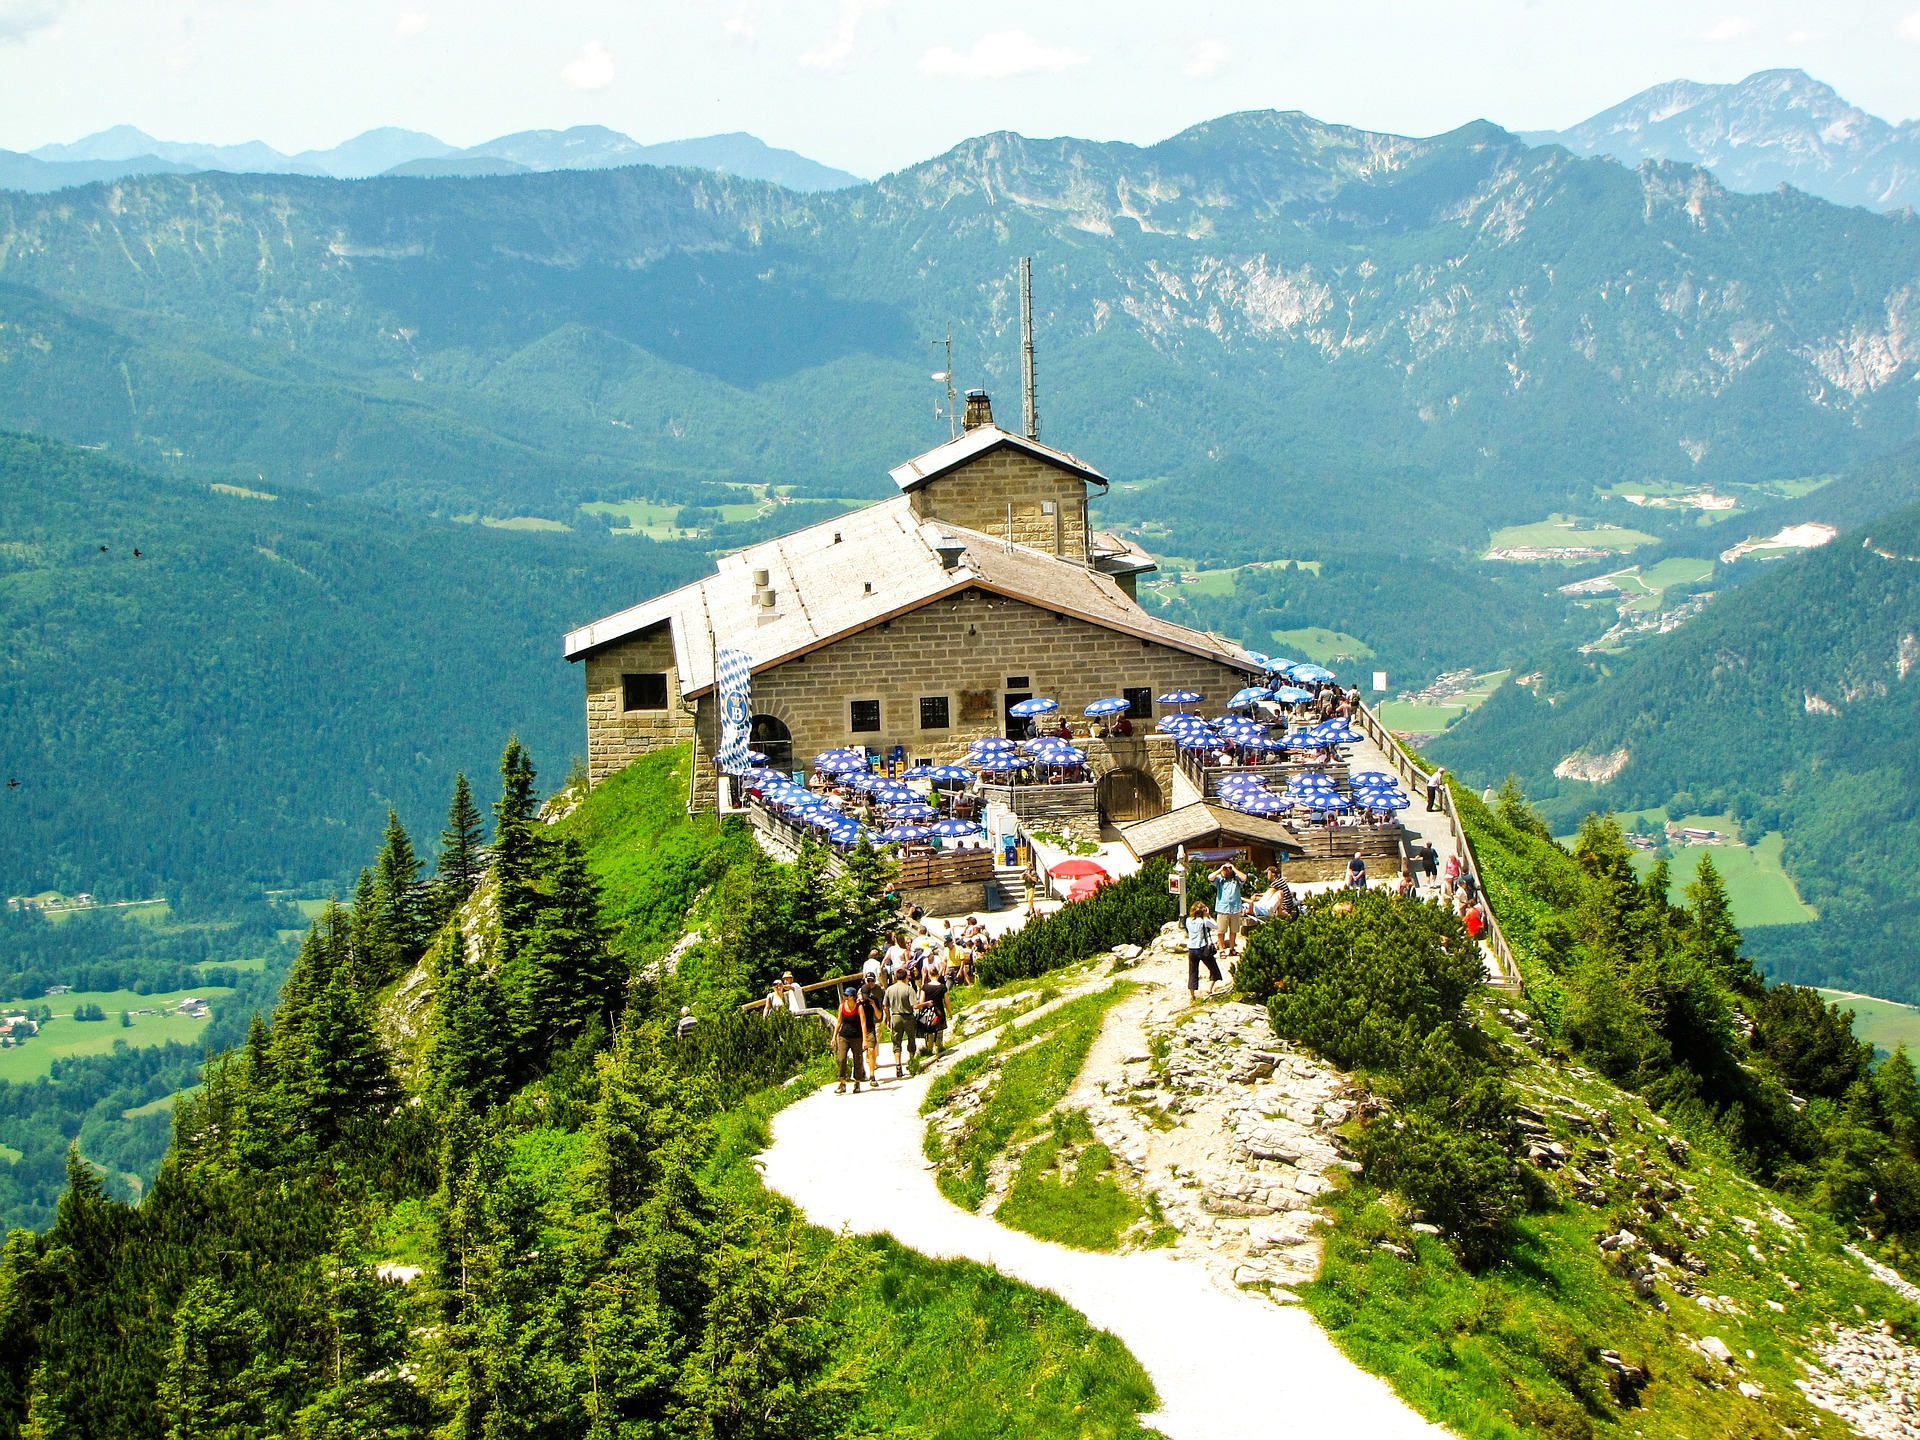 Het Kehlsteinhaus